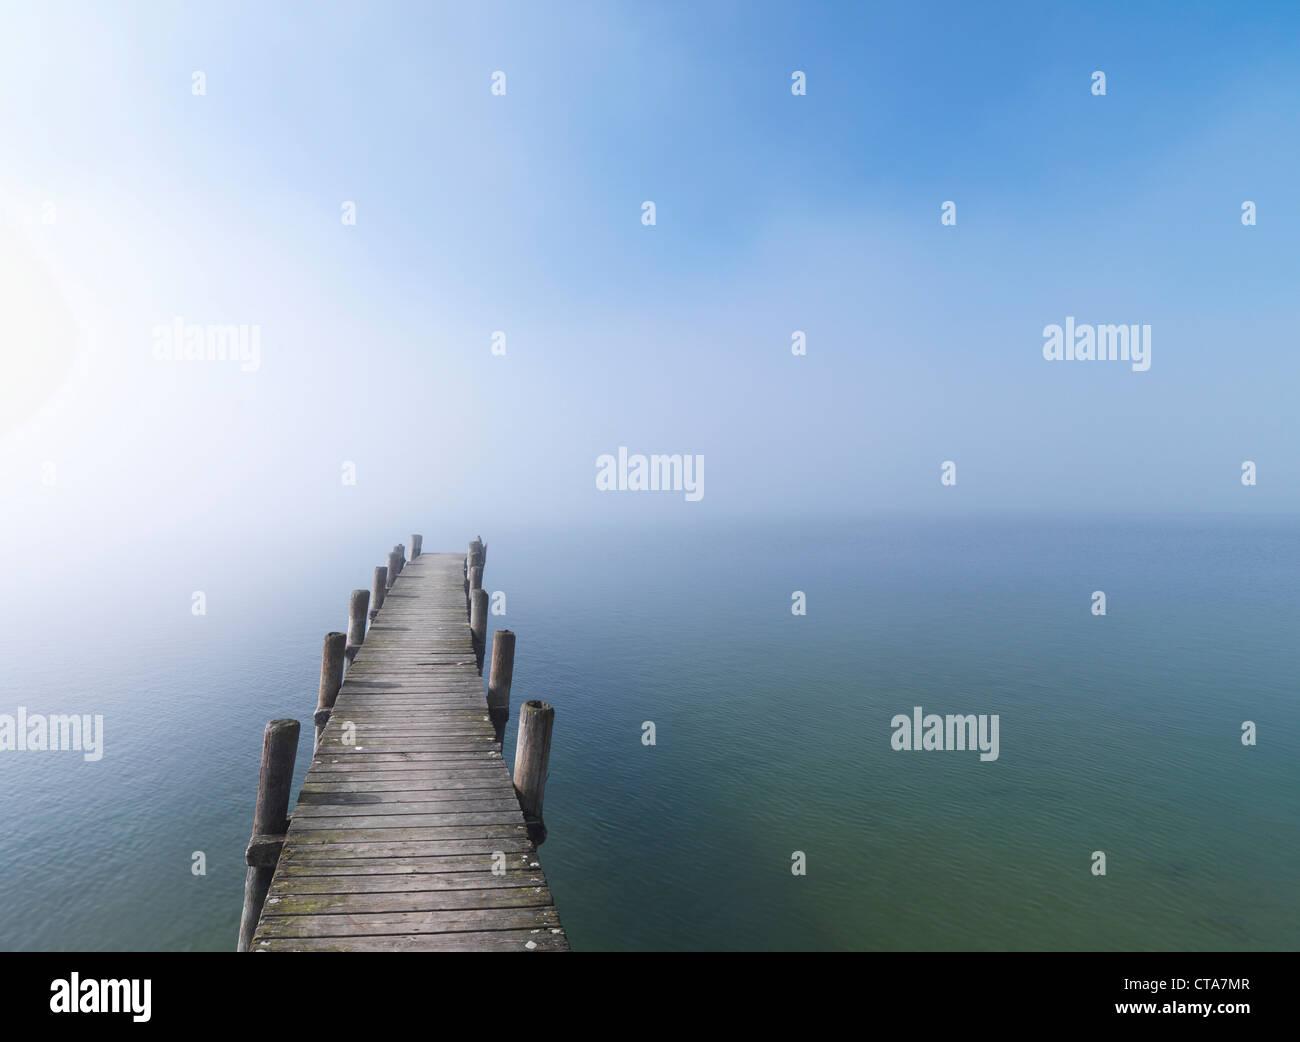 Wooden jetty in fog at lake Chiemsee, Frauenchiemsee, Chiemgau, Bavaria, Germany Stock Photo